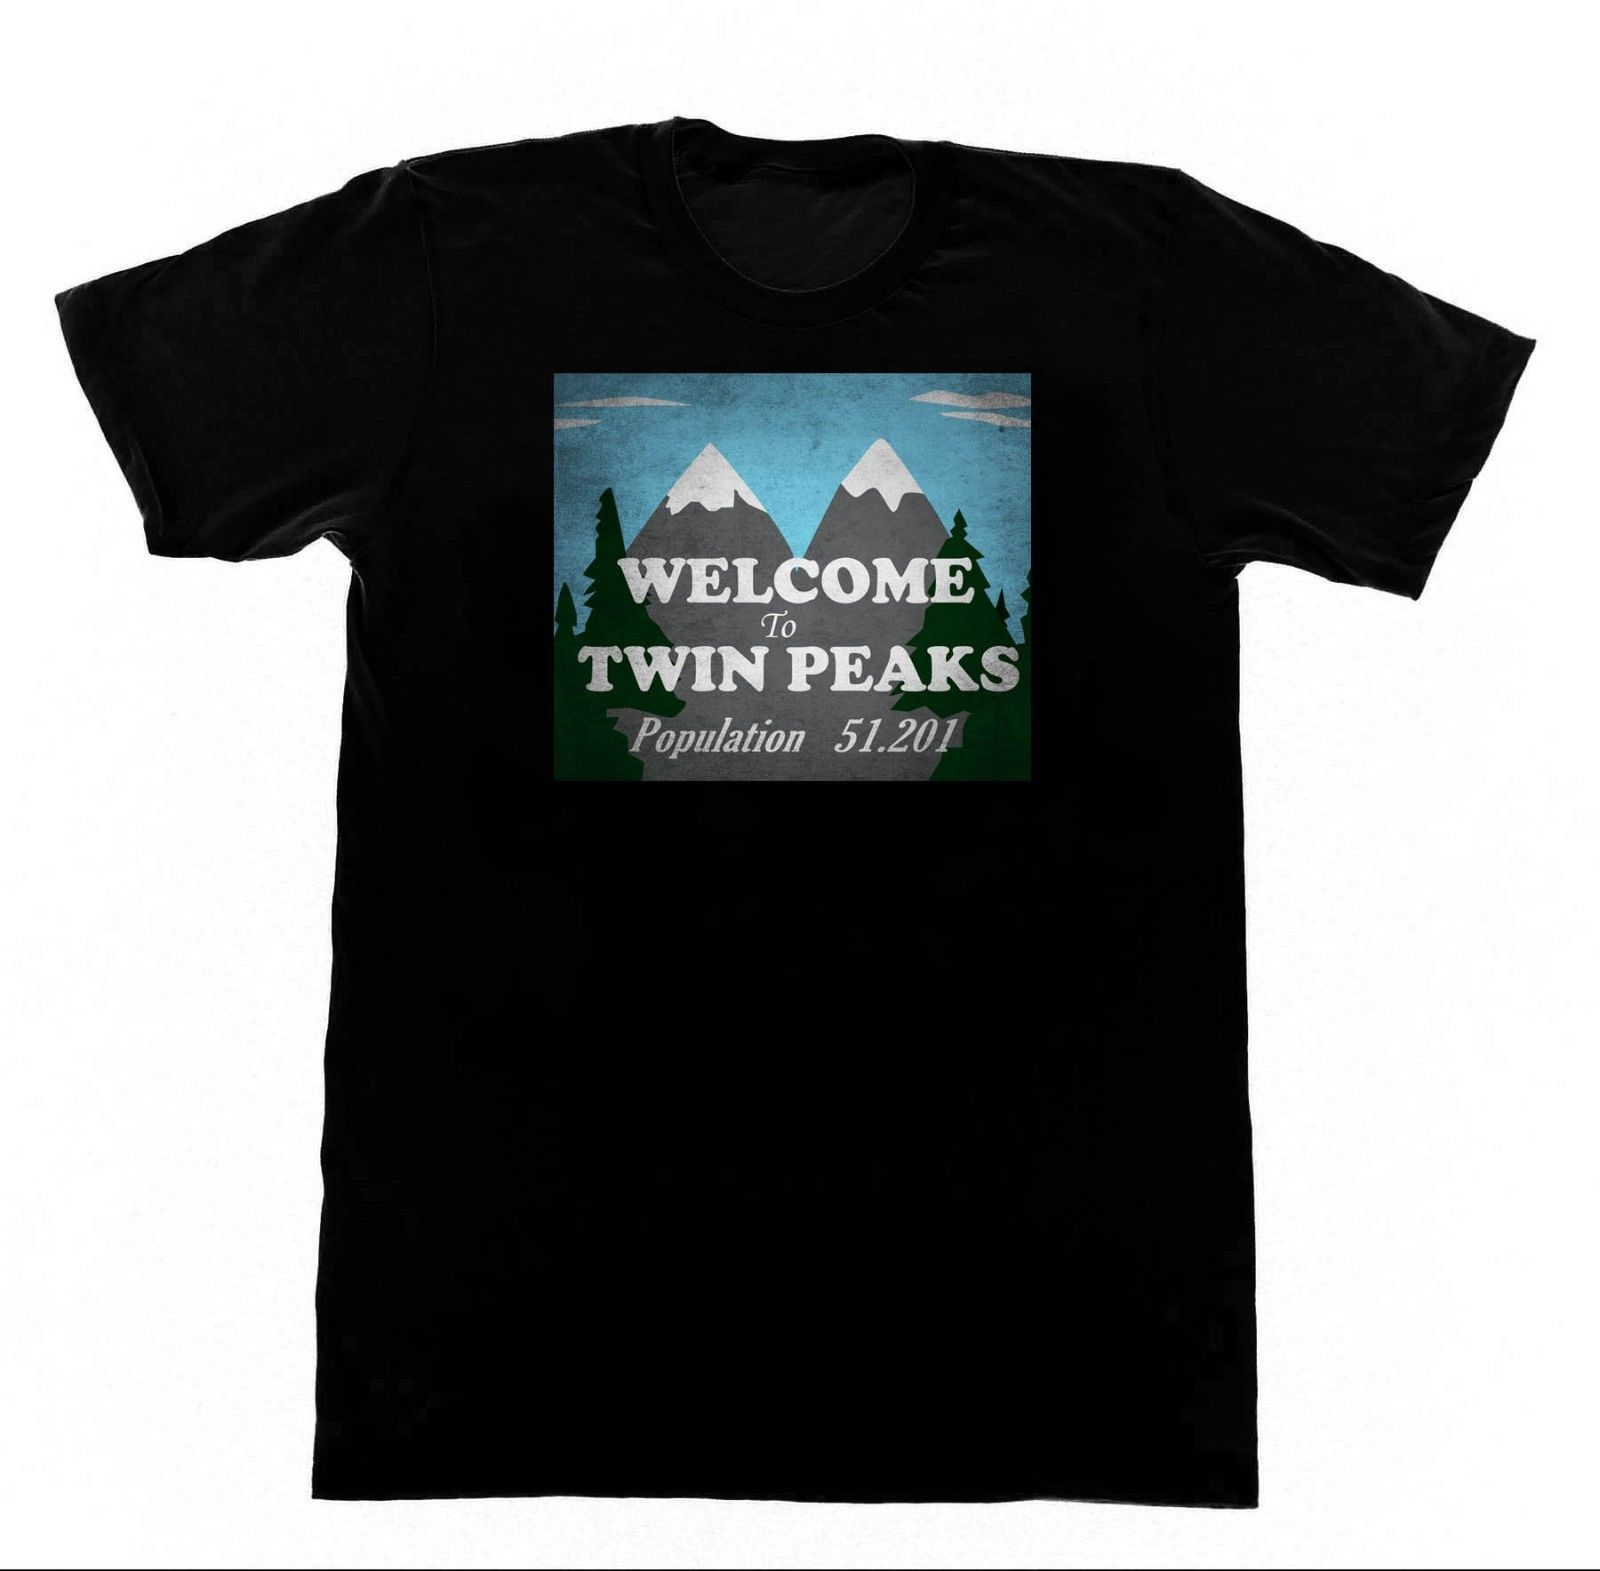 Welcome to Twin Peaks - Shirt TShirt 110 Shirt David Lynch